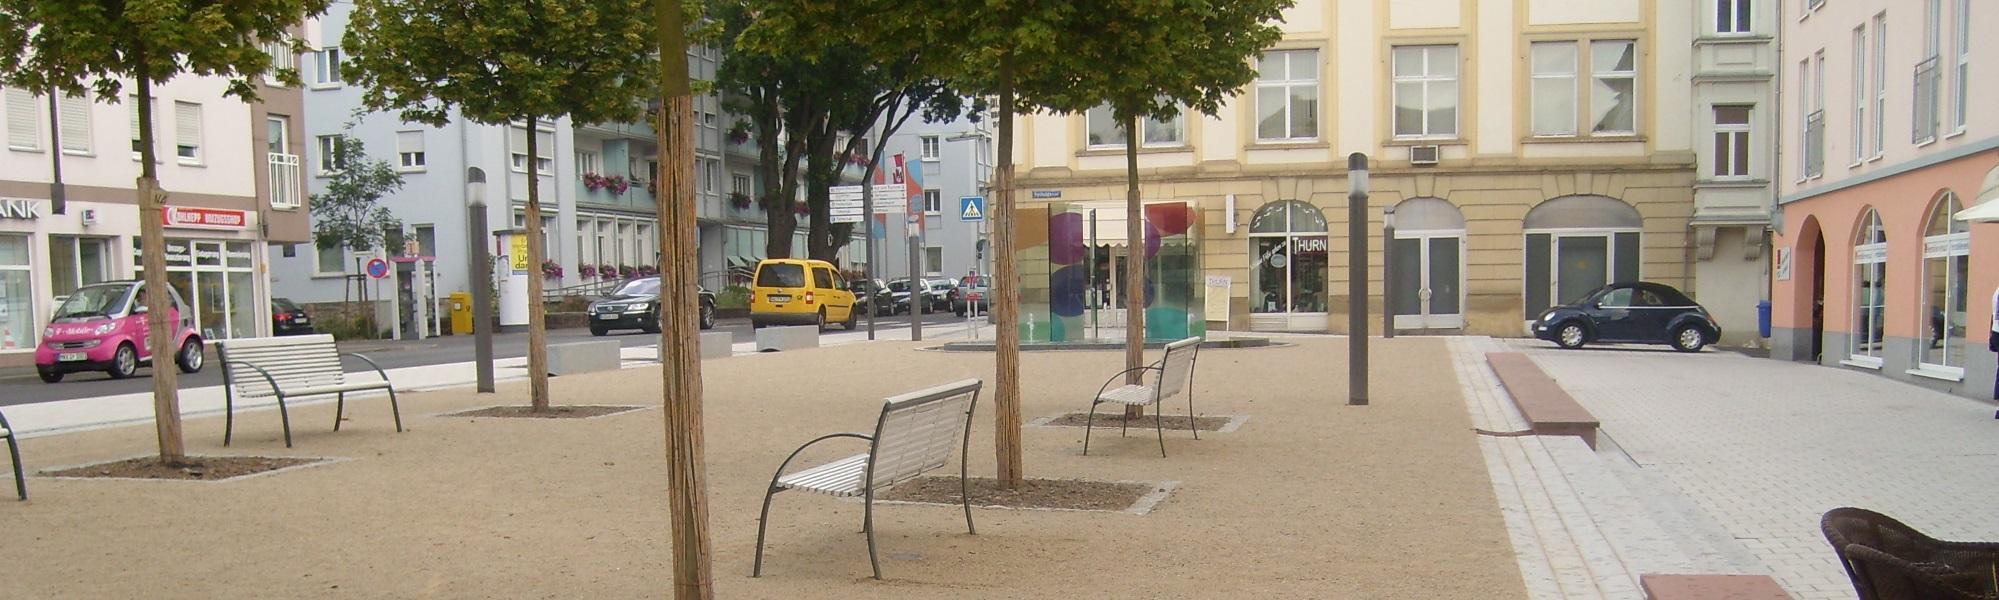 Platz Wegedecke